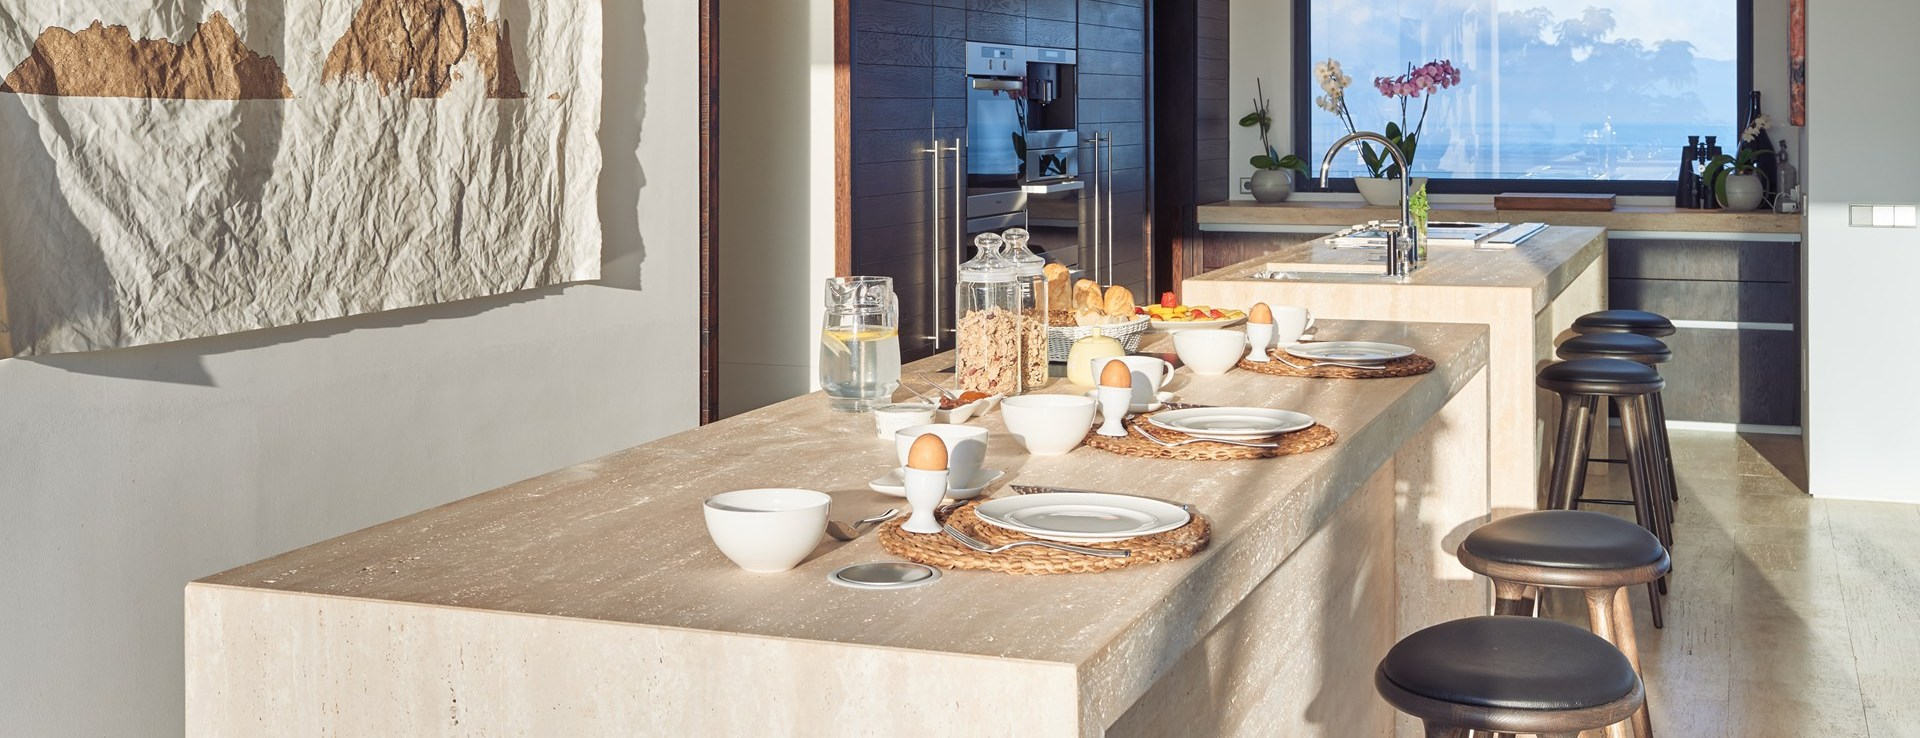 villa-can-castello-ibiza-kitchen